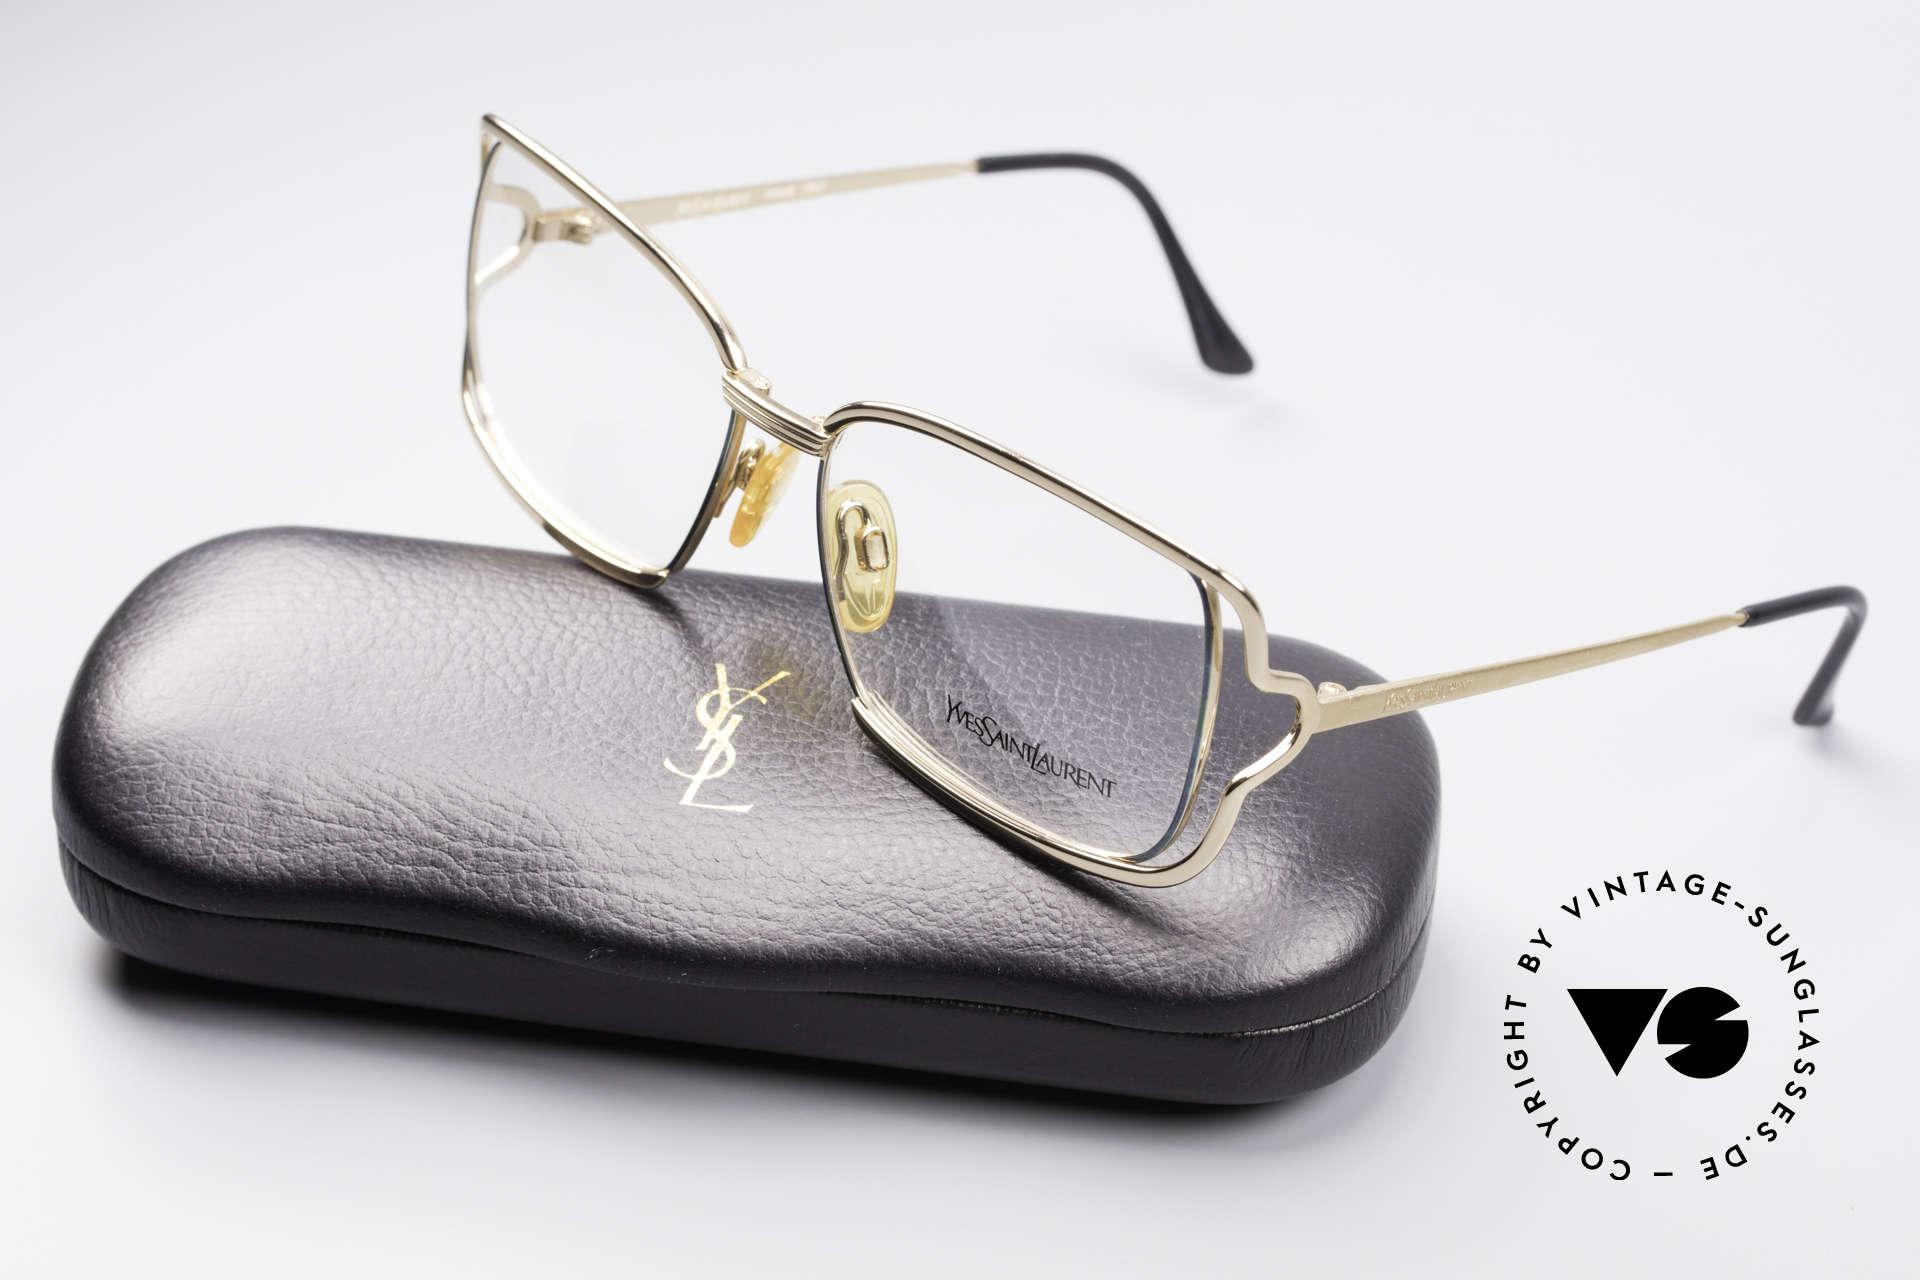 Yves Saint Laurent 4046 Vintage Ladies Eyeglasses, Size: medium, Made for Women